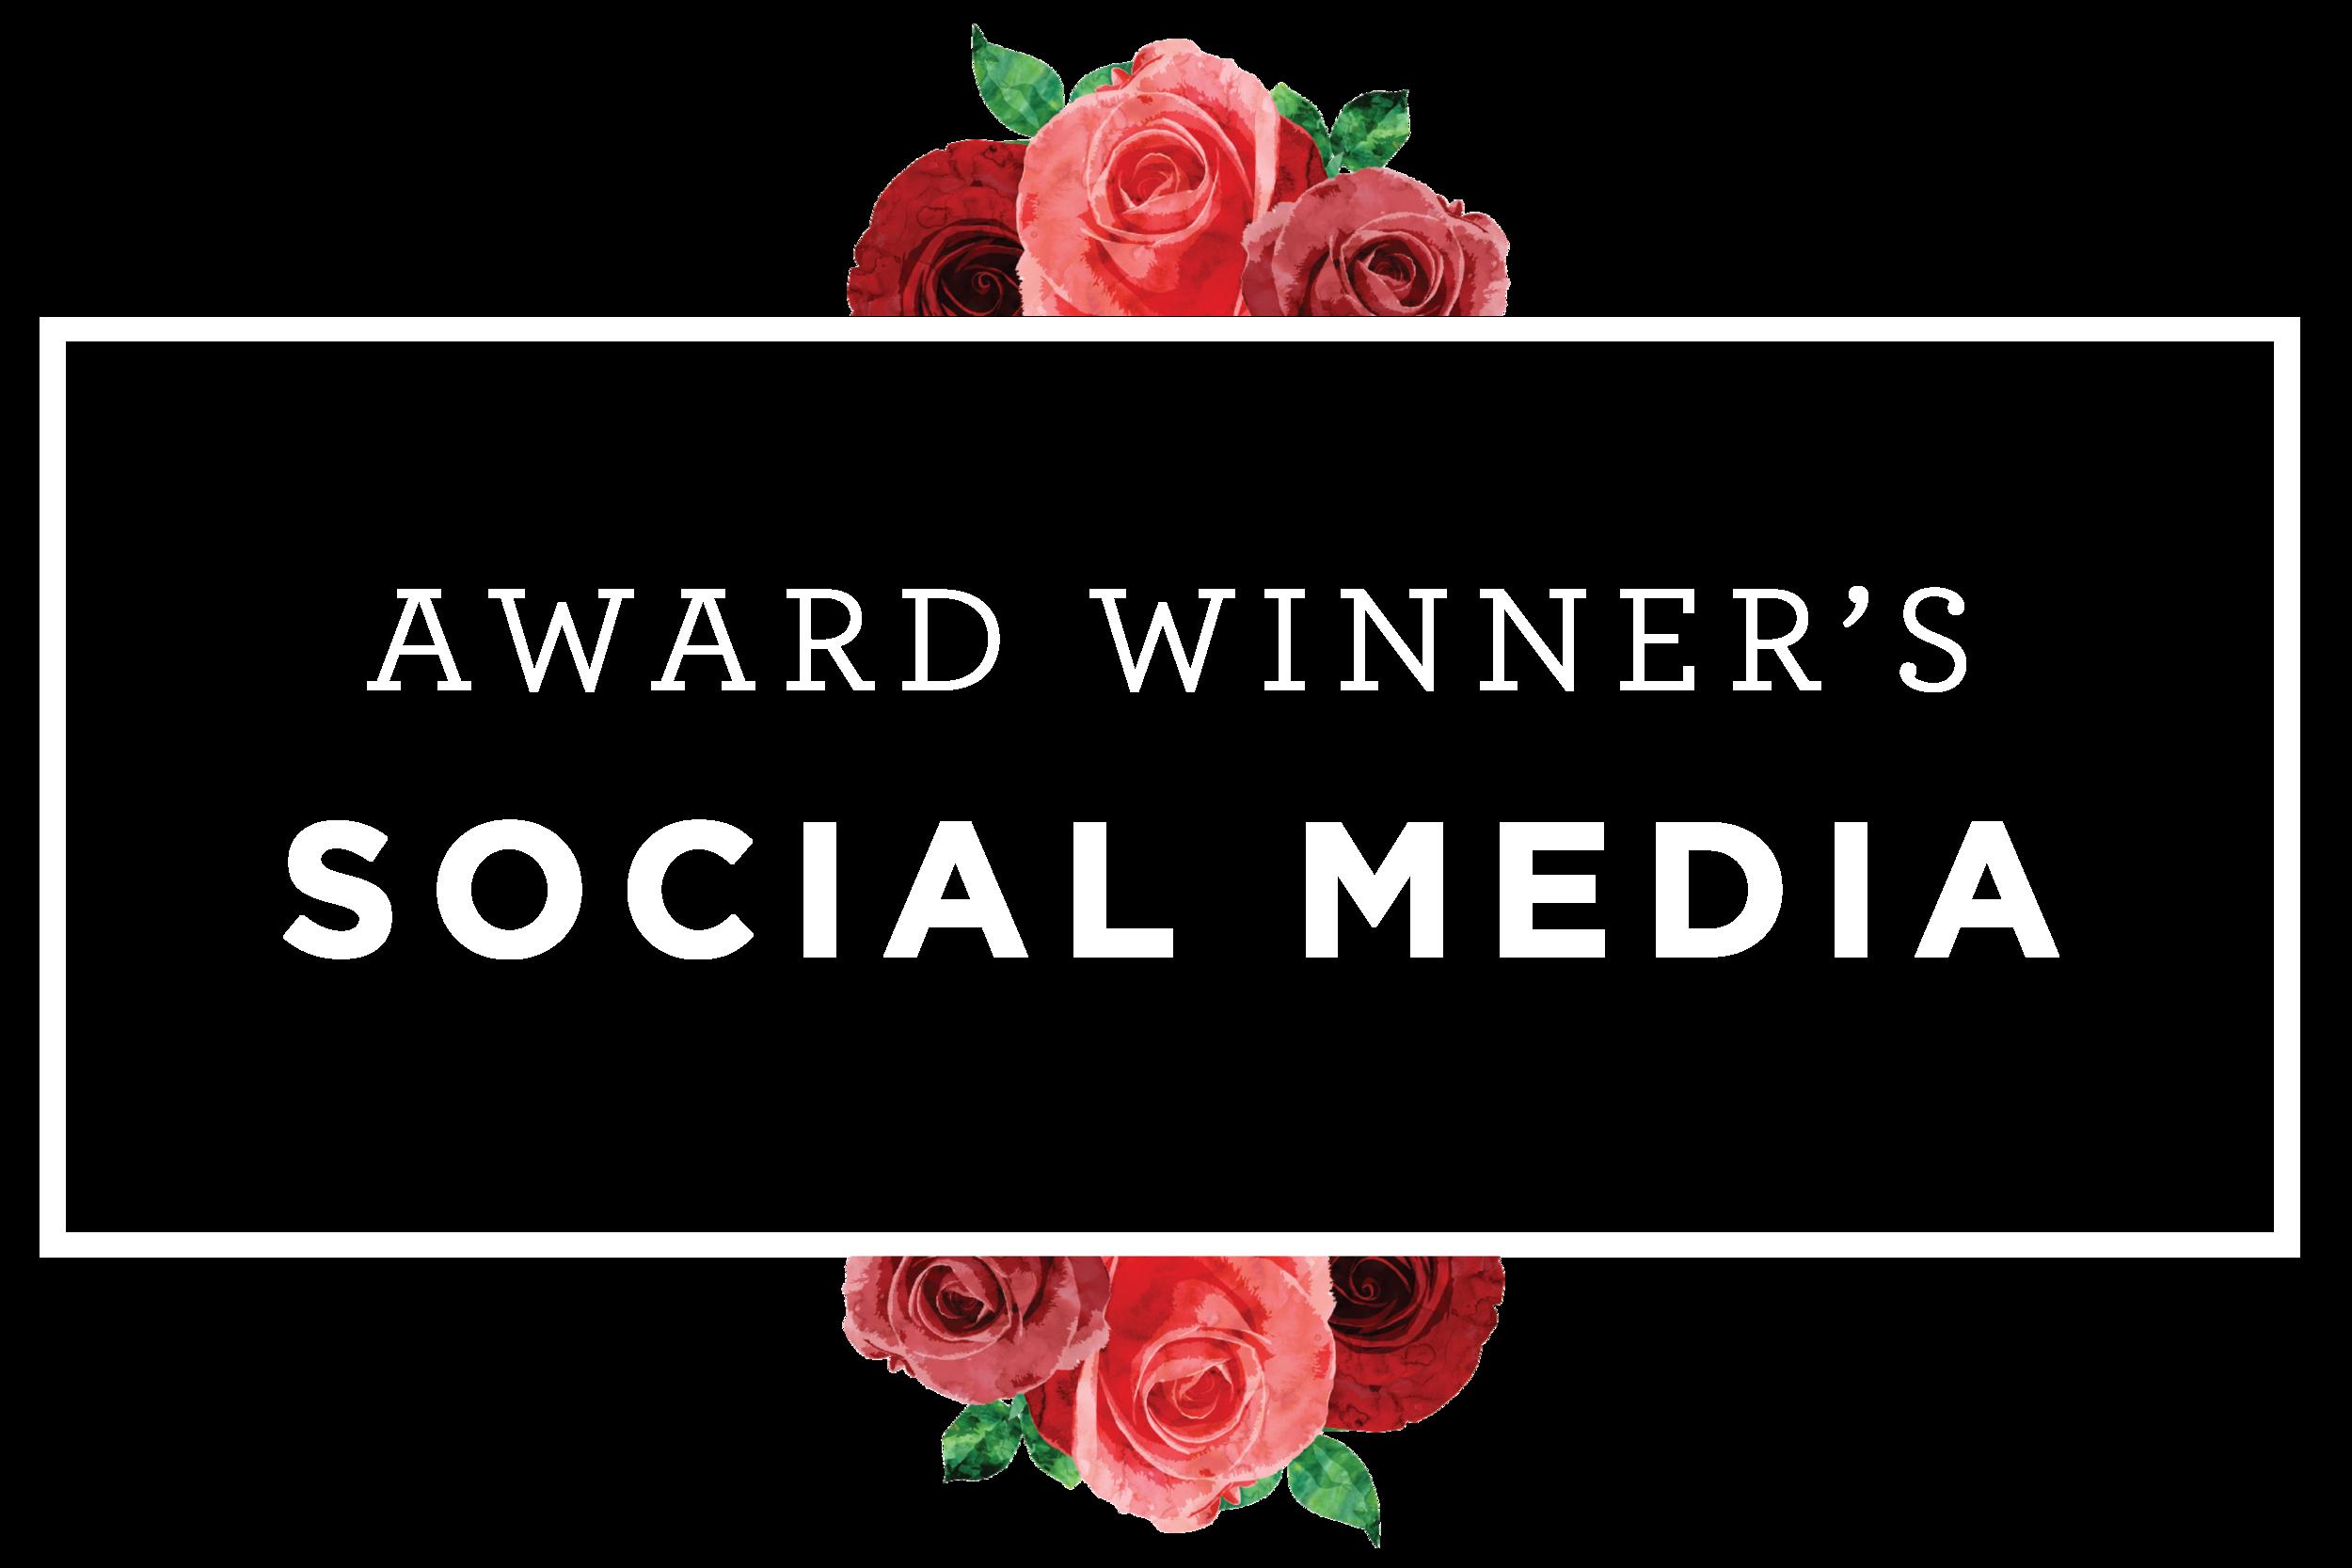 Marketing Kit-Social Media Image.png